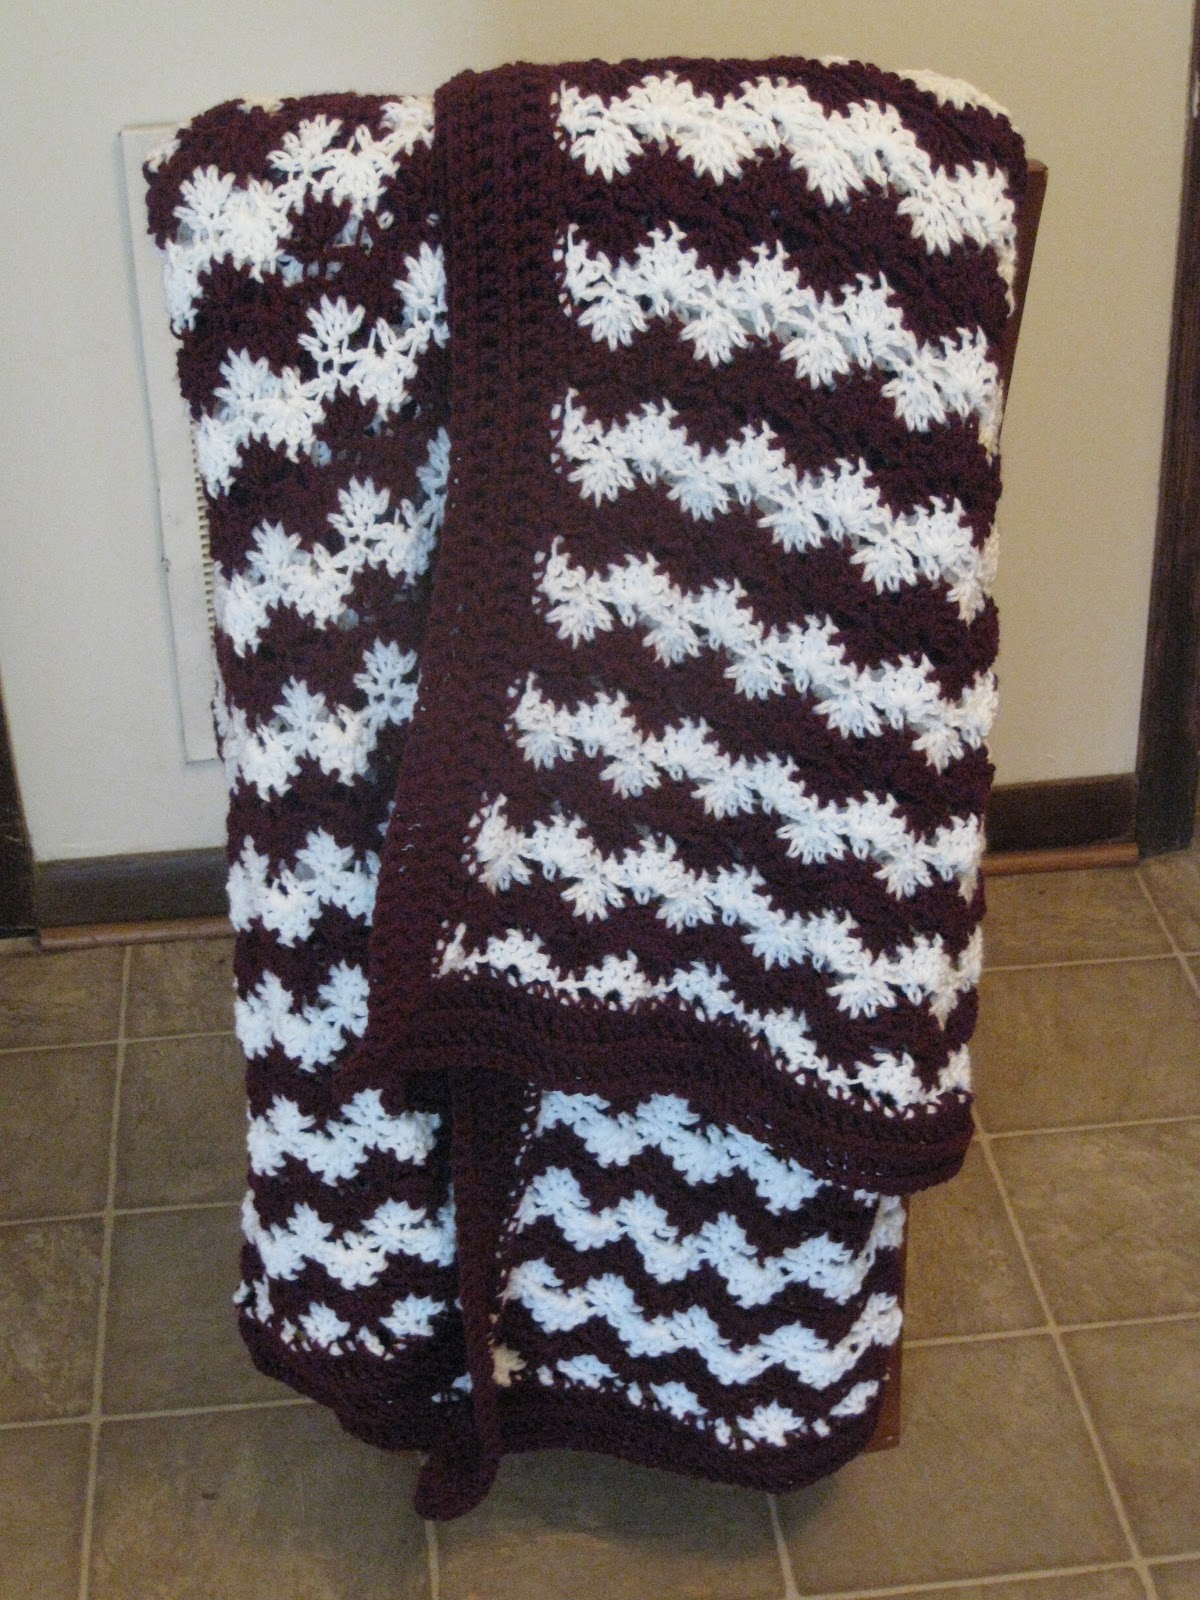 Engineered Crochet: 12th Man Blanket